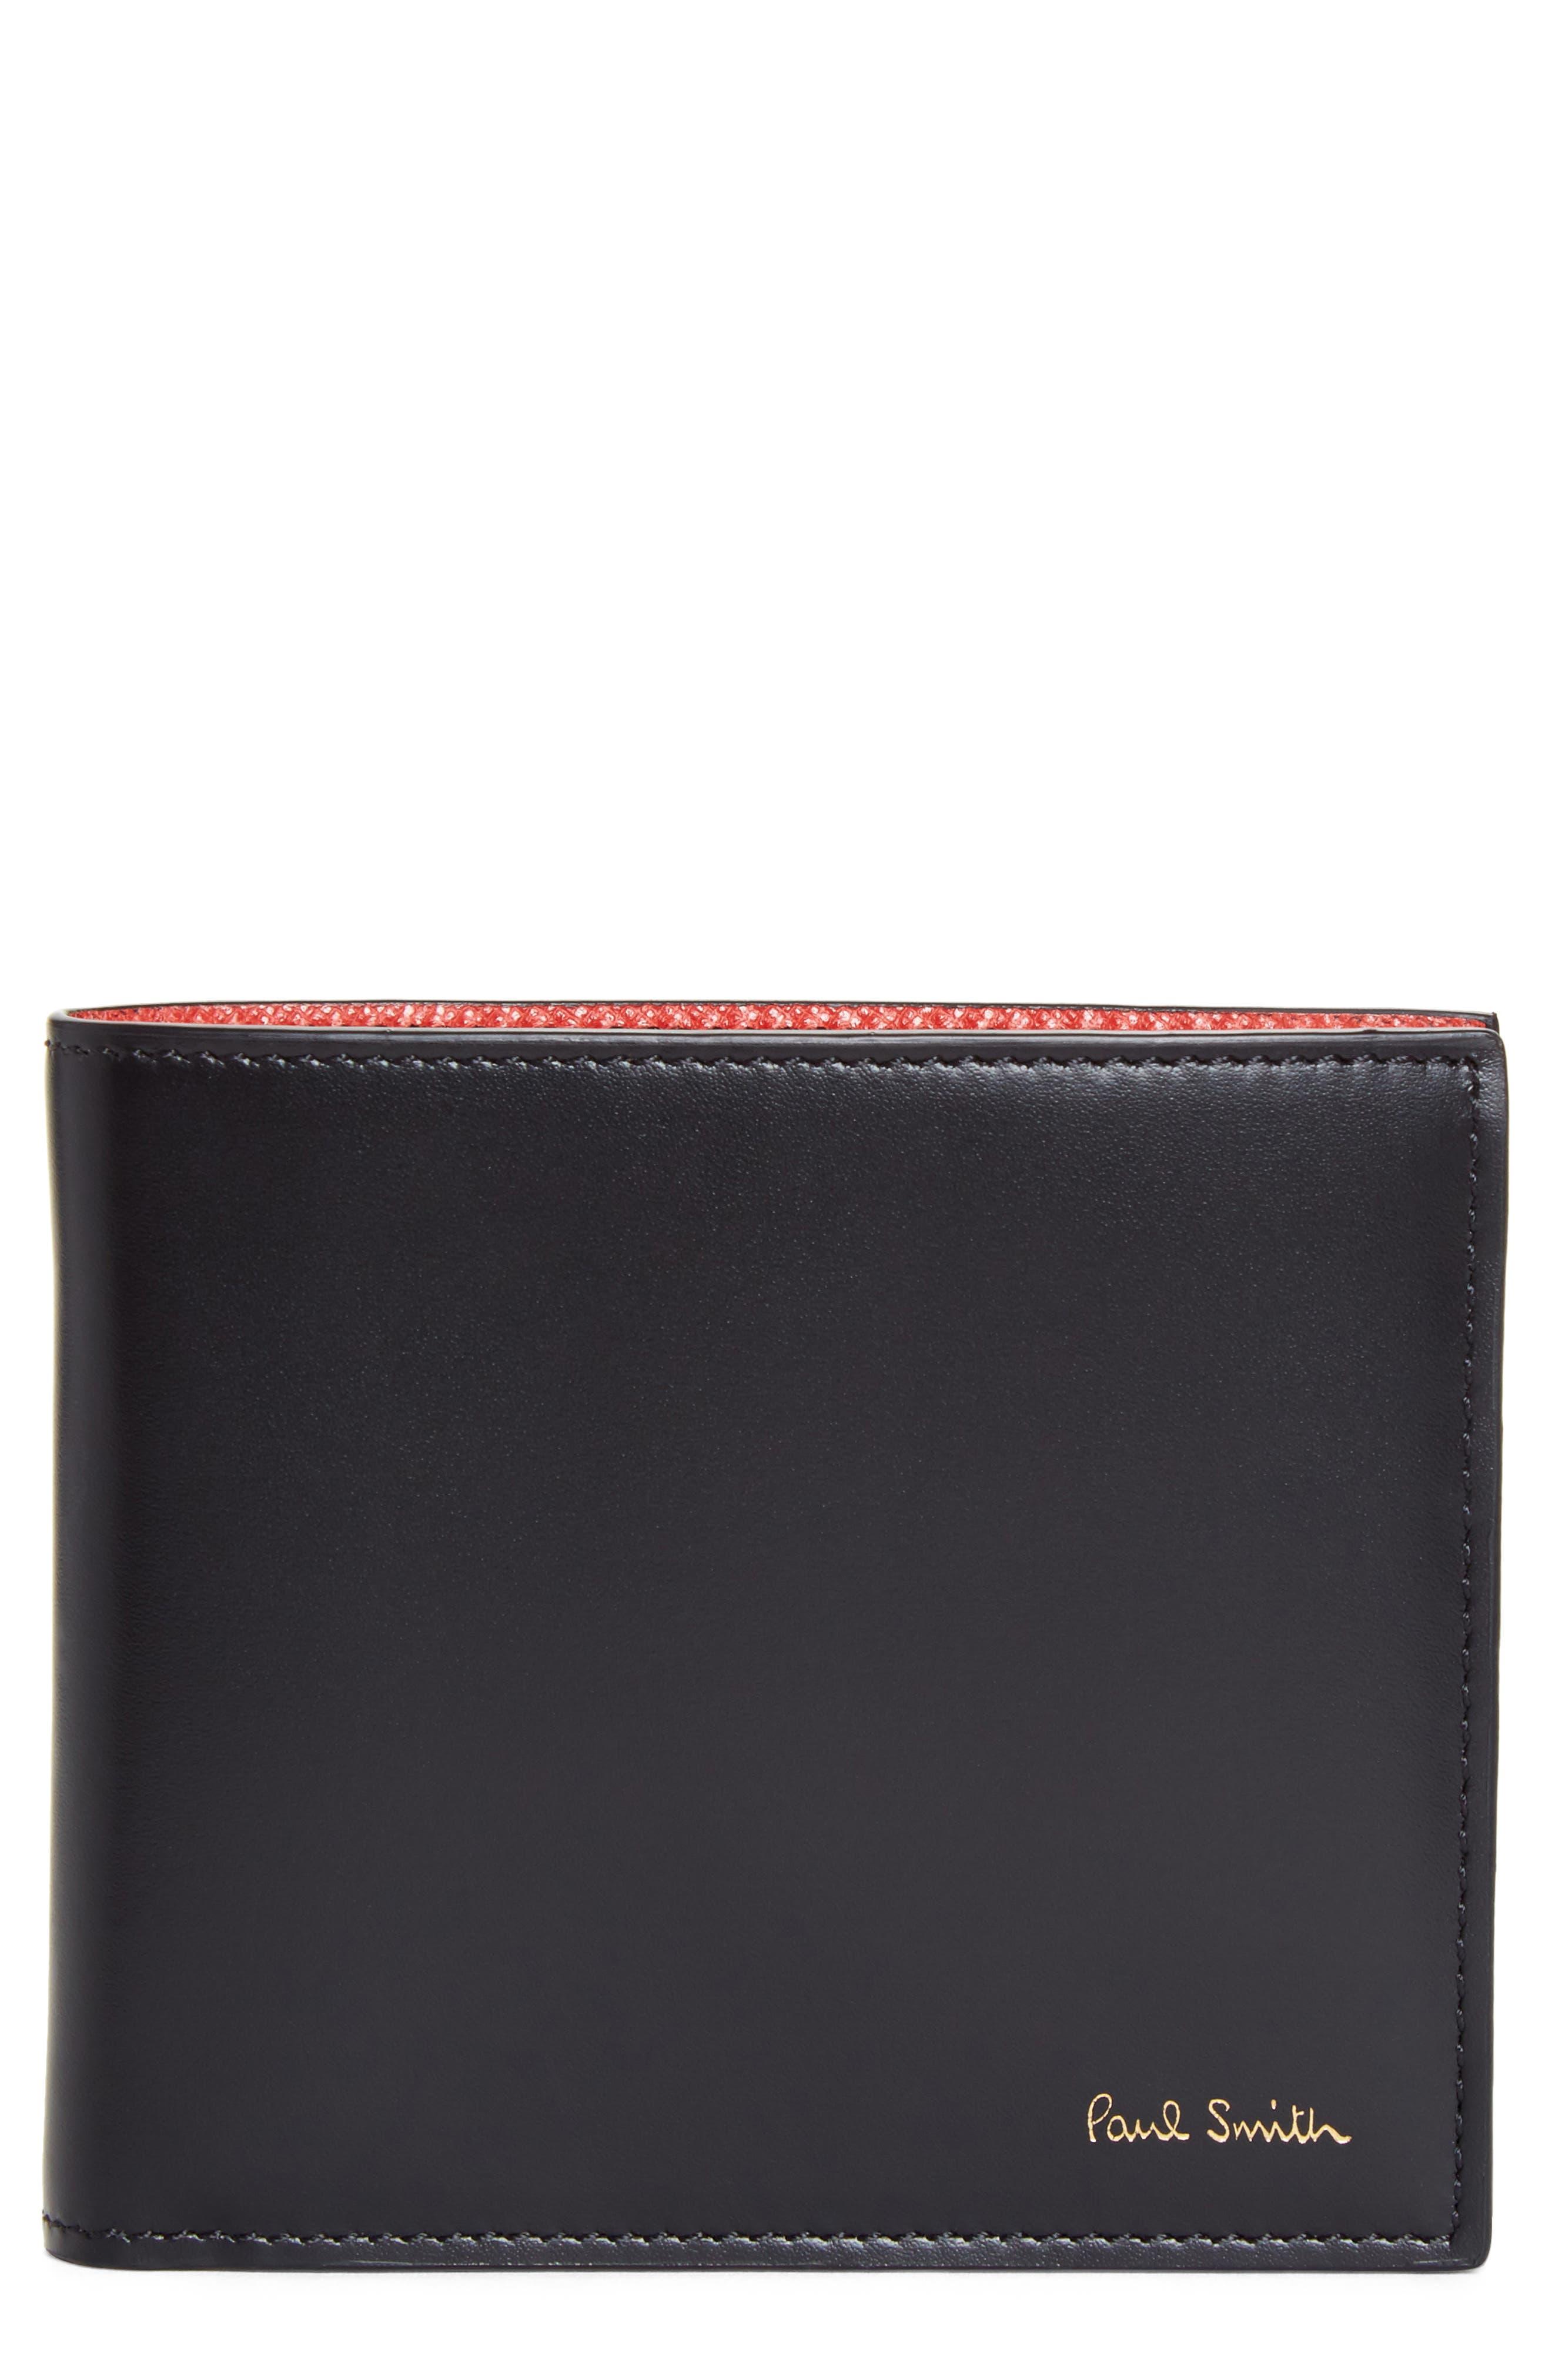 Leopard Print Billfold Wallet,                         Main,                         color, 001